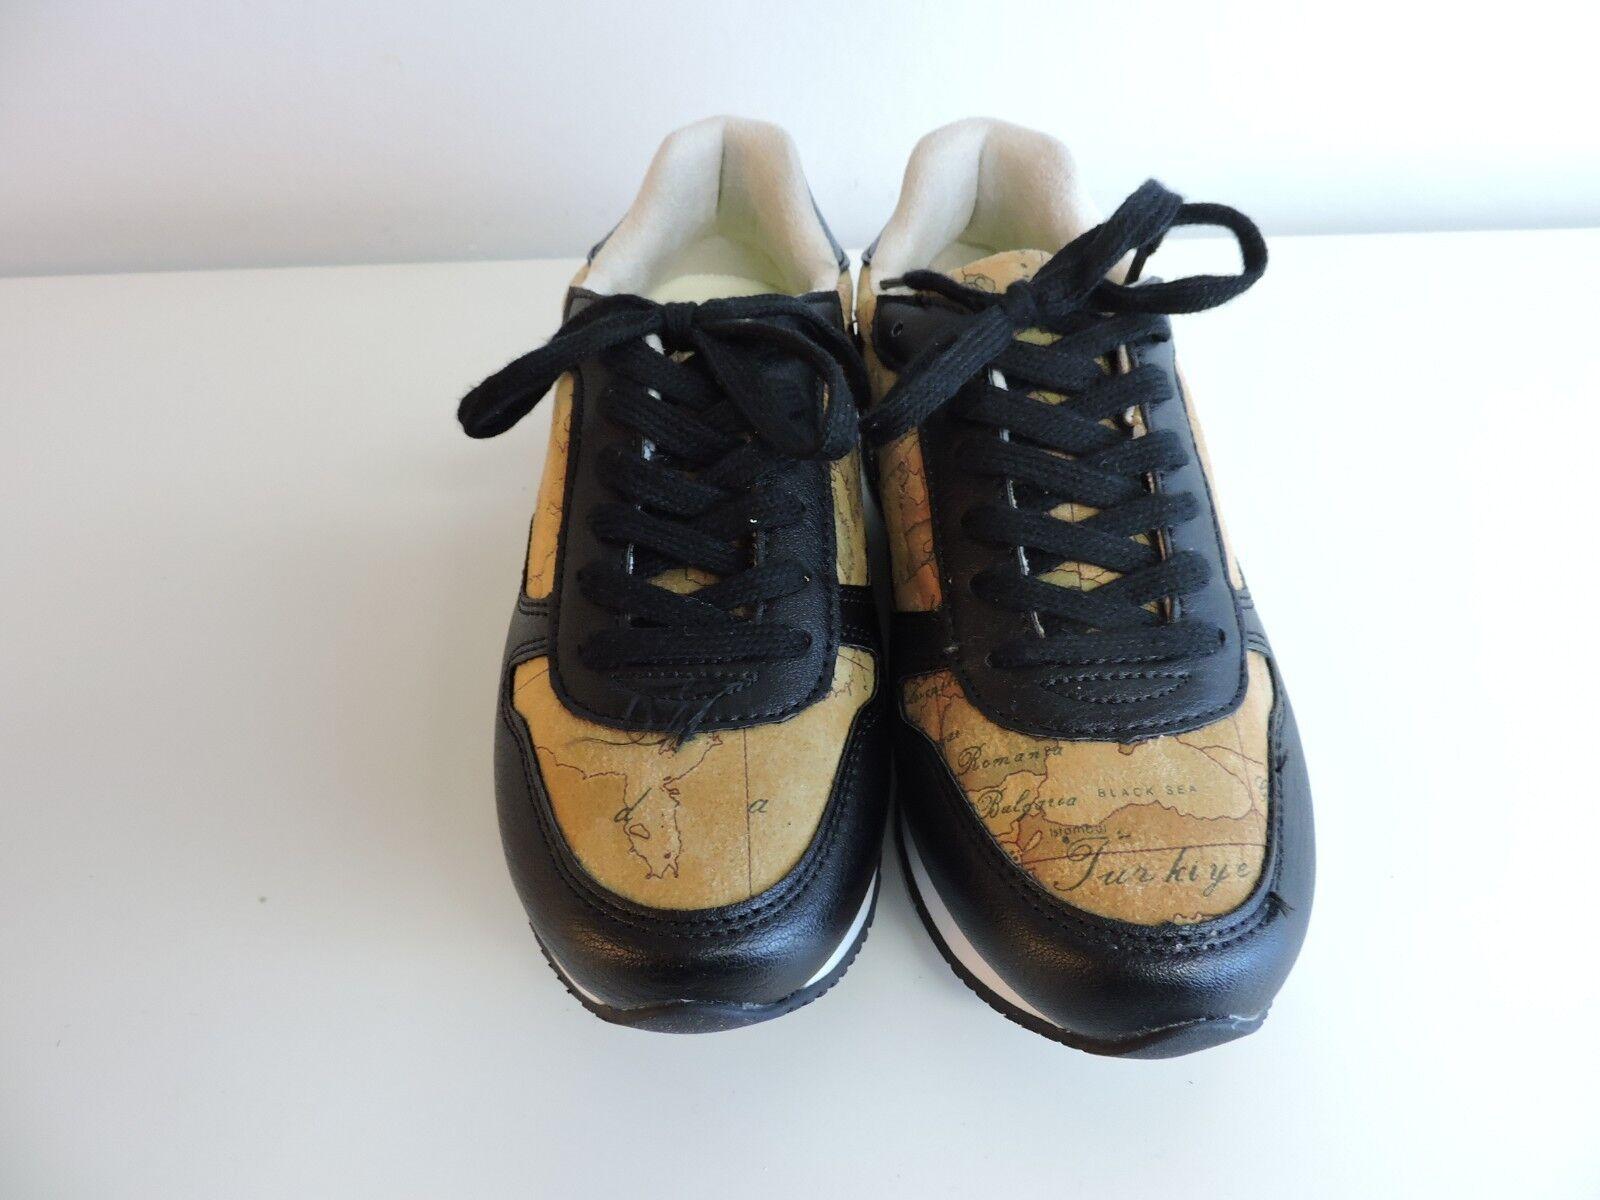 zapatos zapatillas zapatillas zapatillas STRINGATA ALVIERO MARTINI  negro GEO BEIGE  ventas en linea